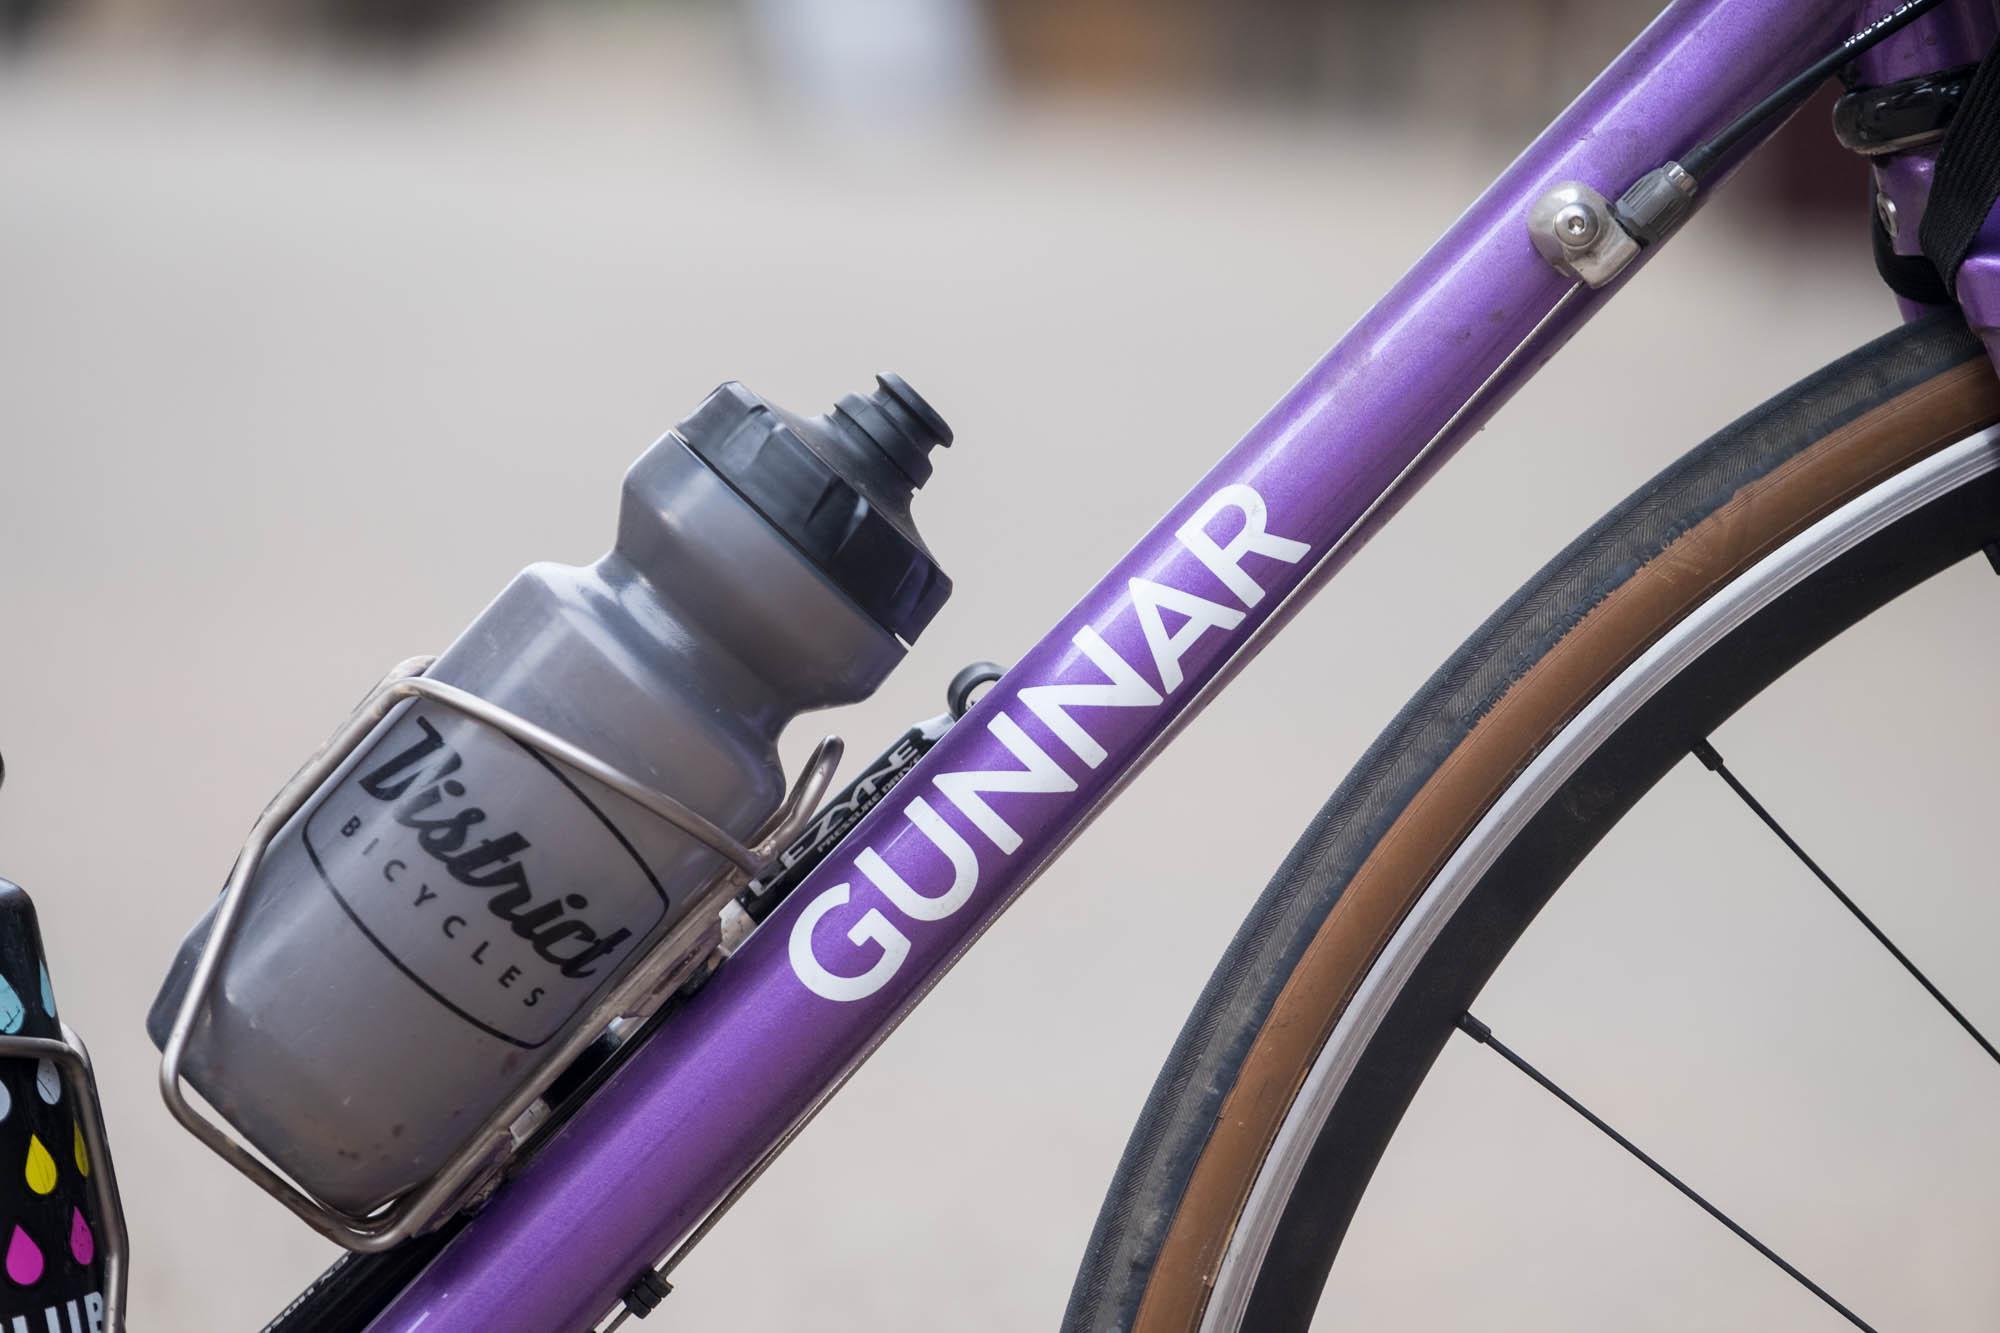 Crytal Wintle's Gunnar